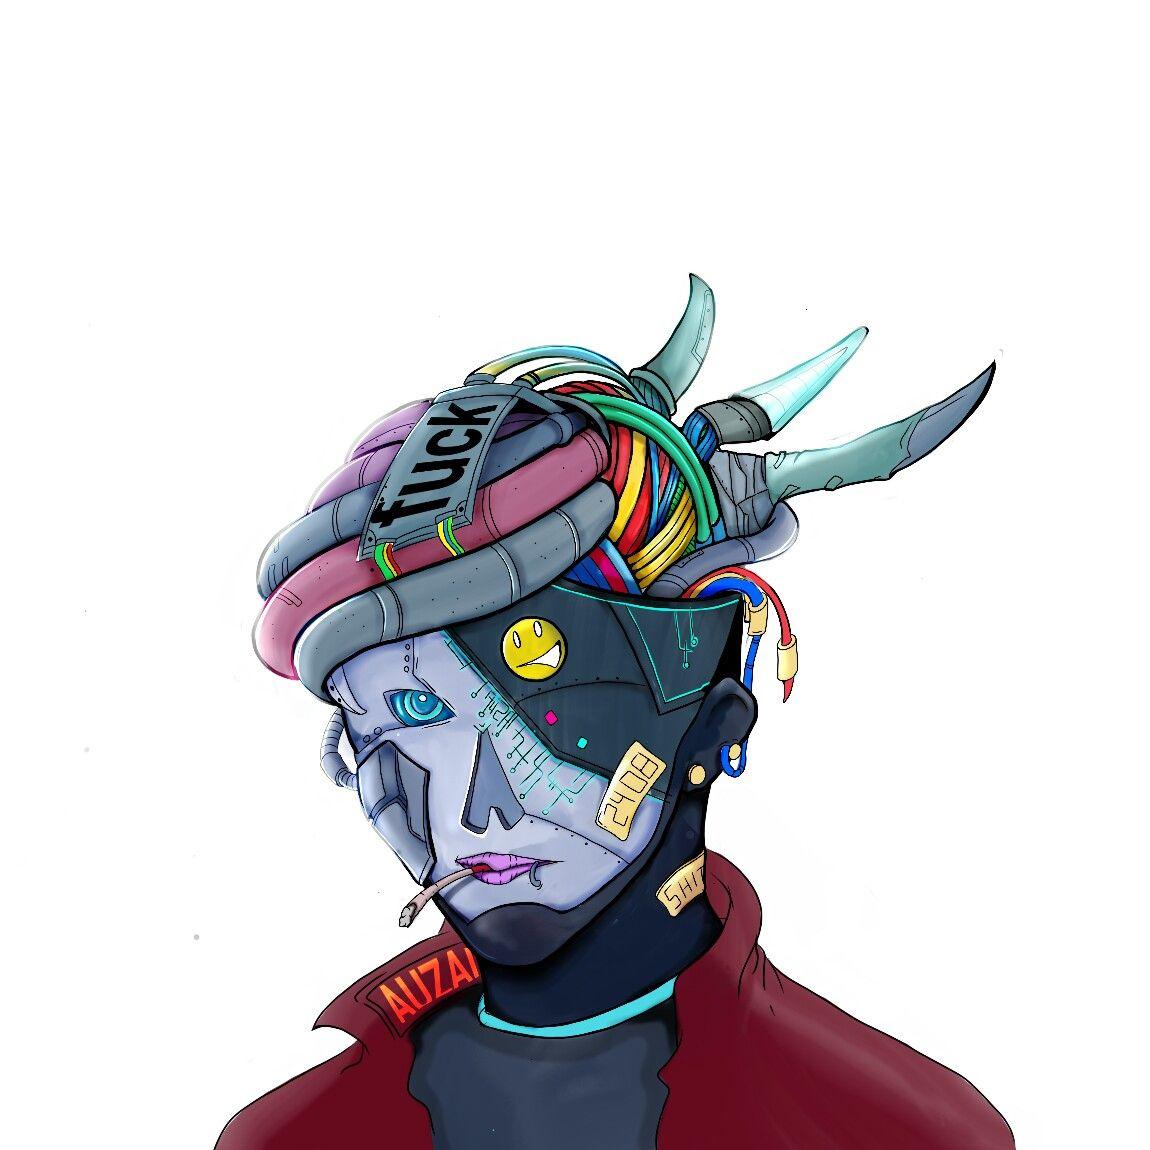 Pin By Iffah Fathin On Style: Cyberpunk Art By @auzai_